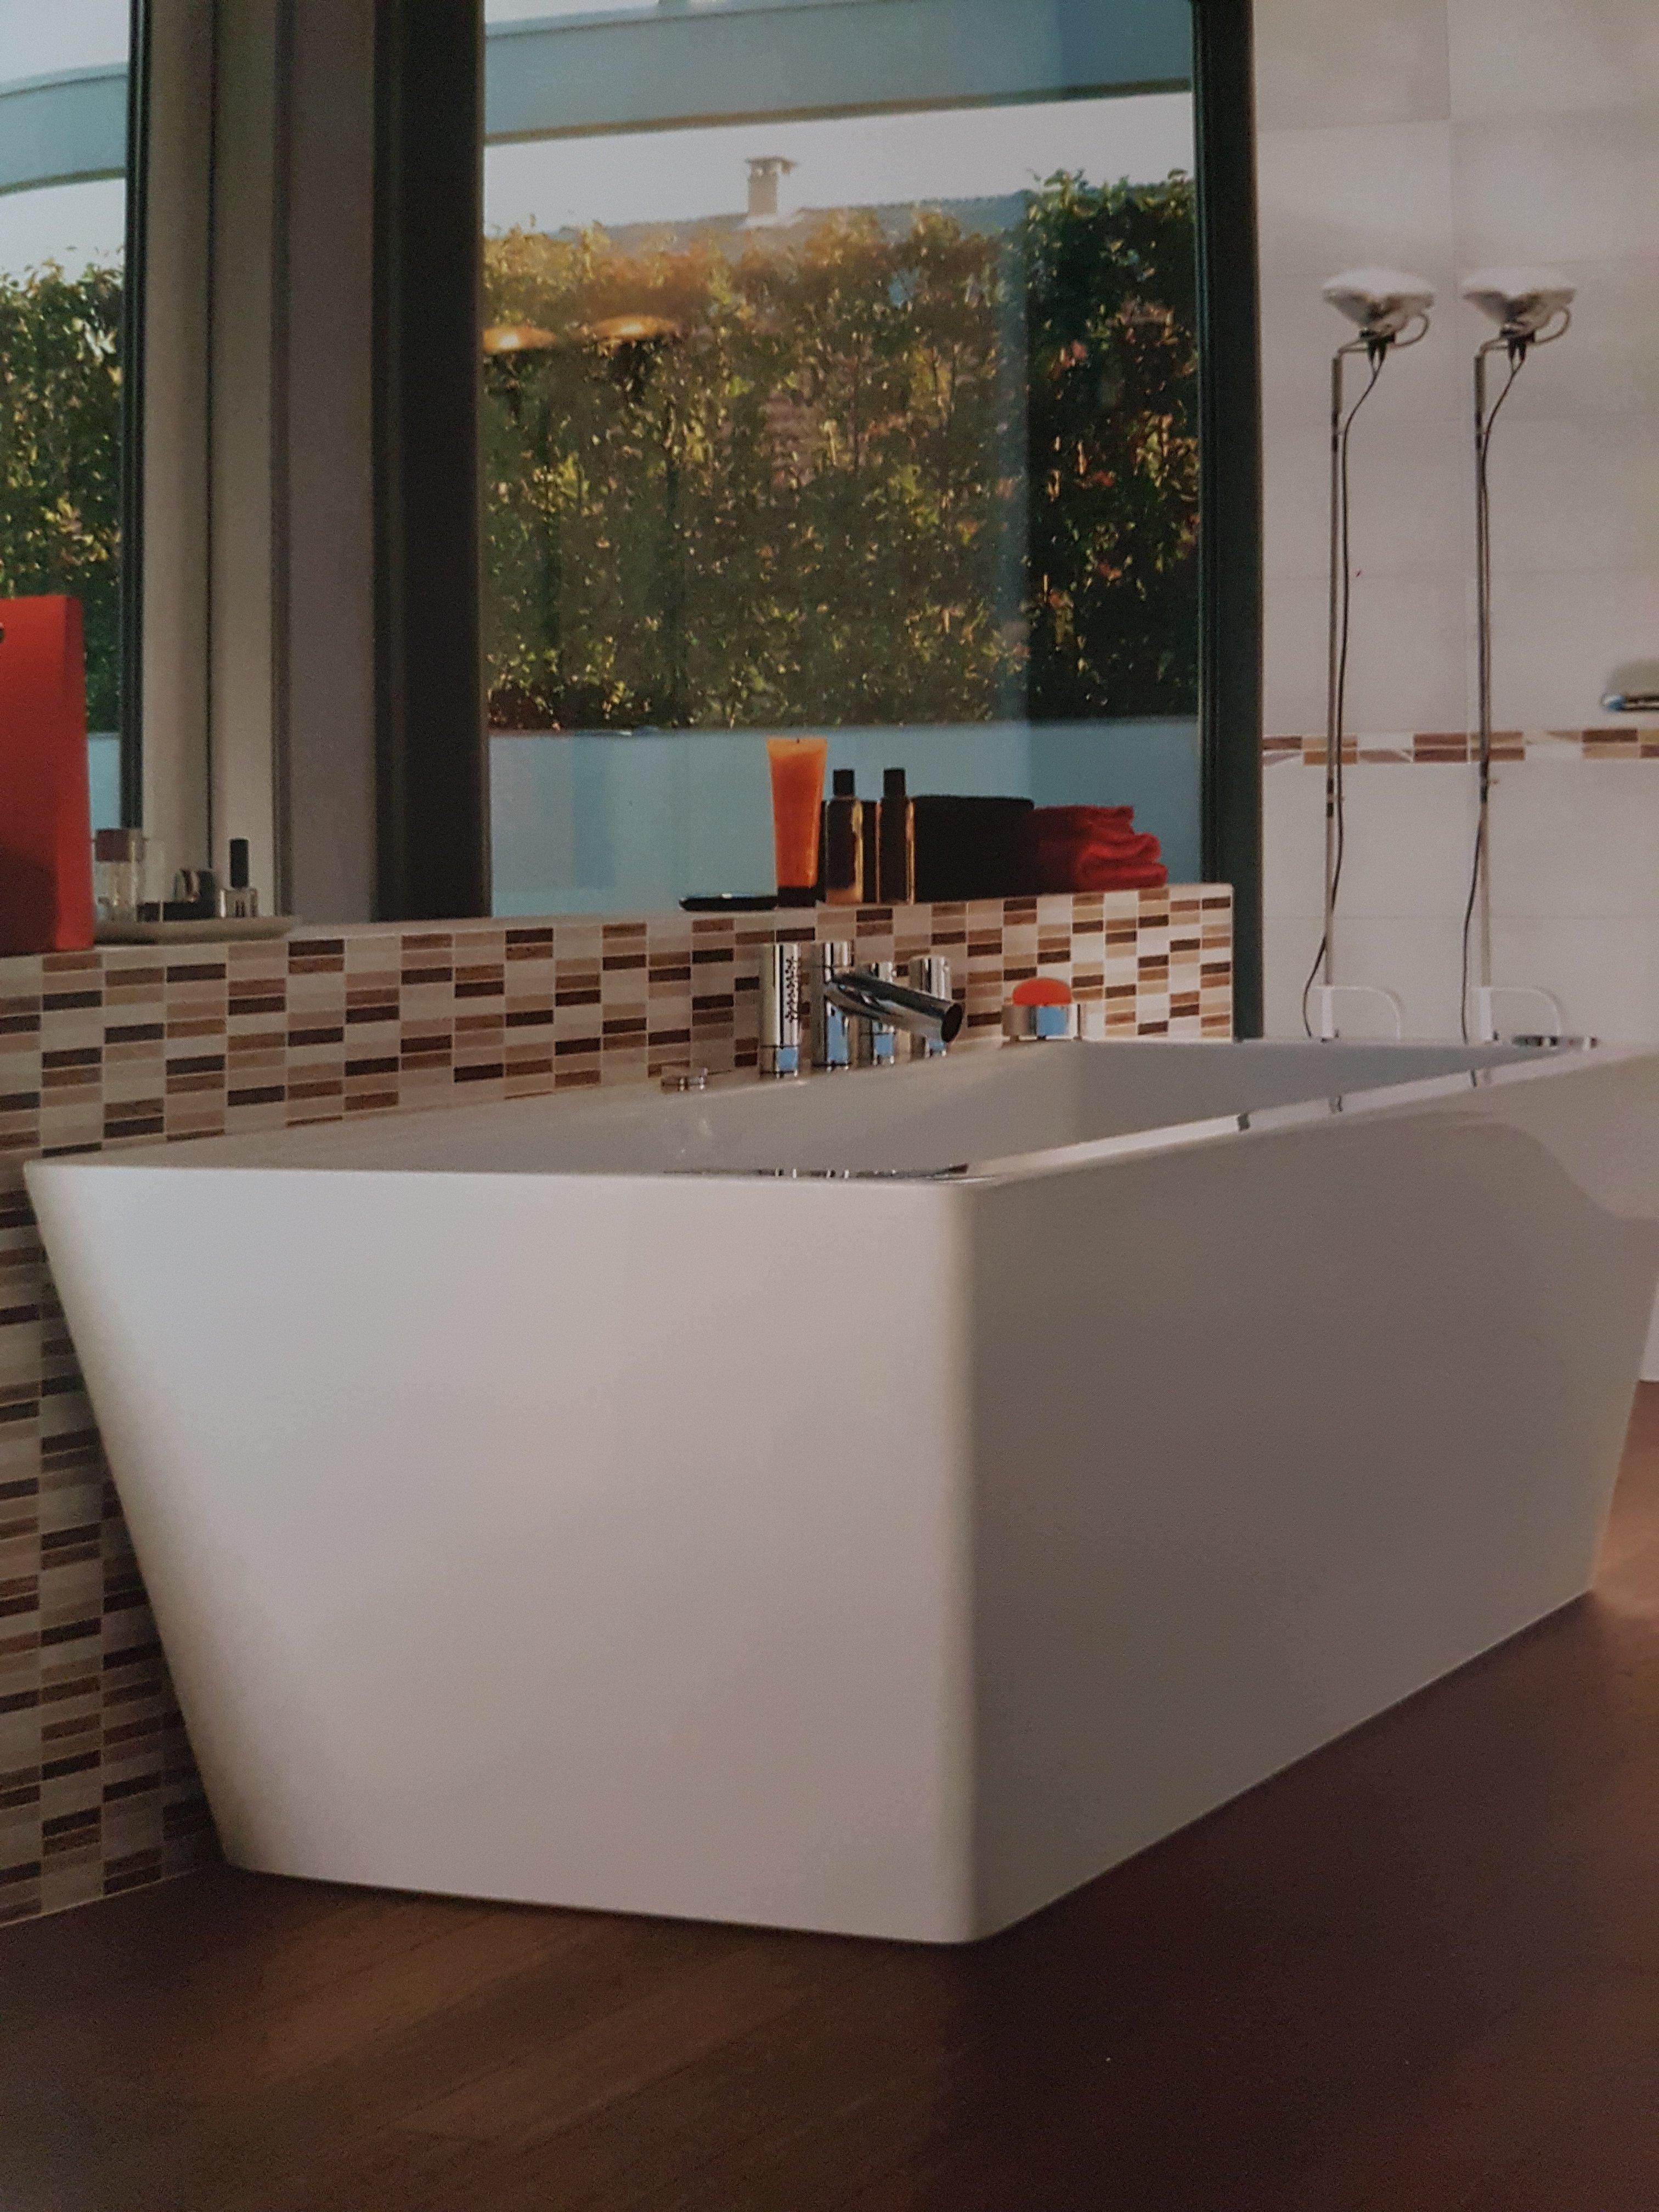 Luxury kitchen and bathroom tiles in Swansea, Llanelli & Gower